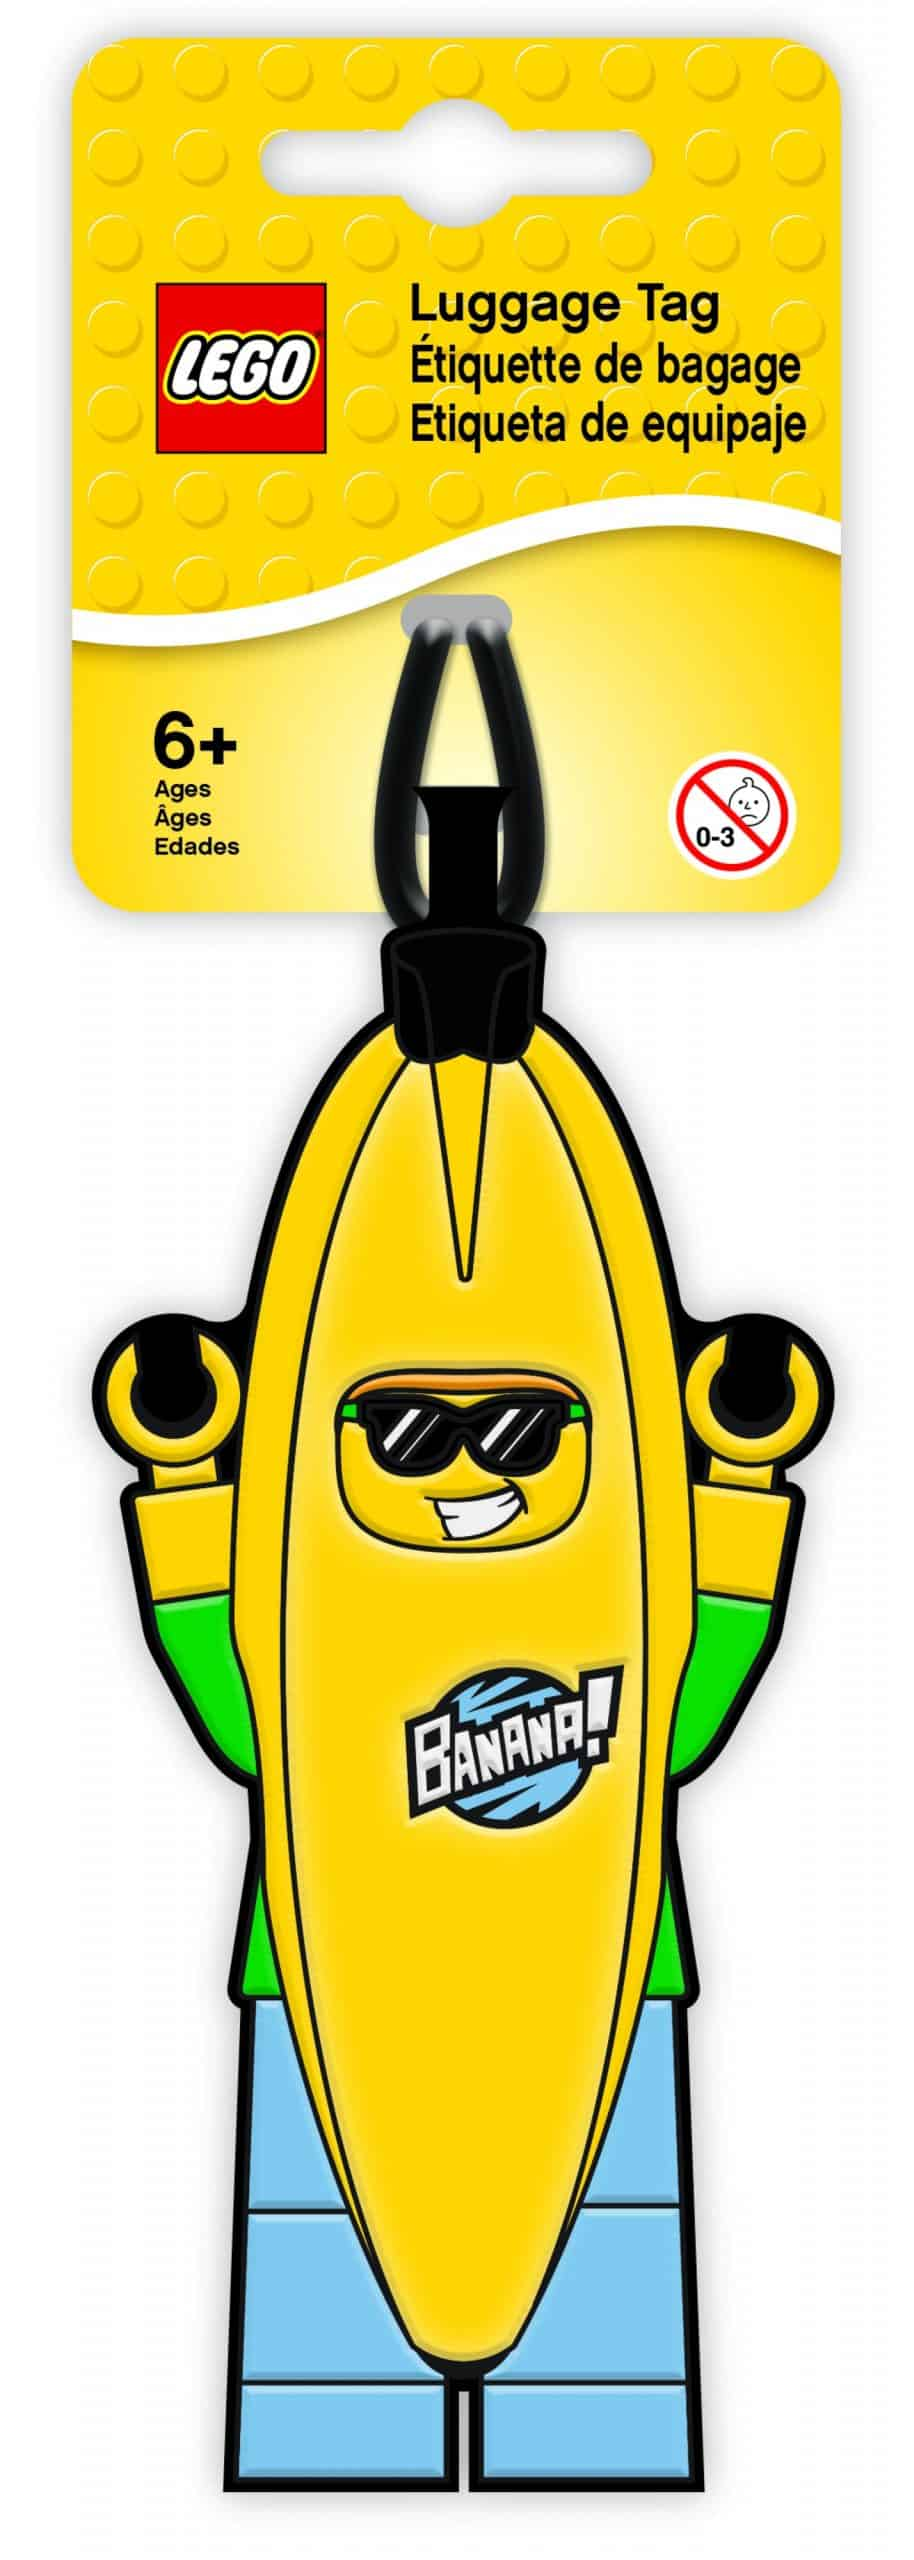 lego 5005580 bagagemaerke med bananfyren scaled